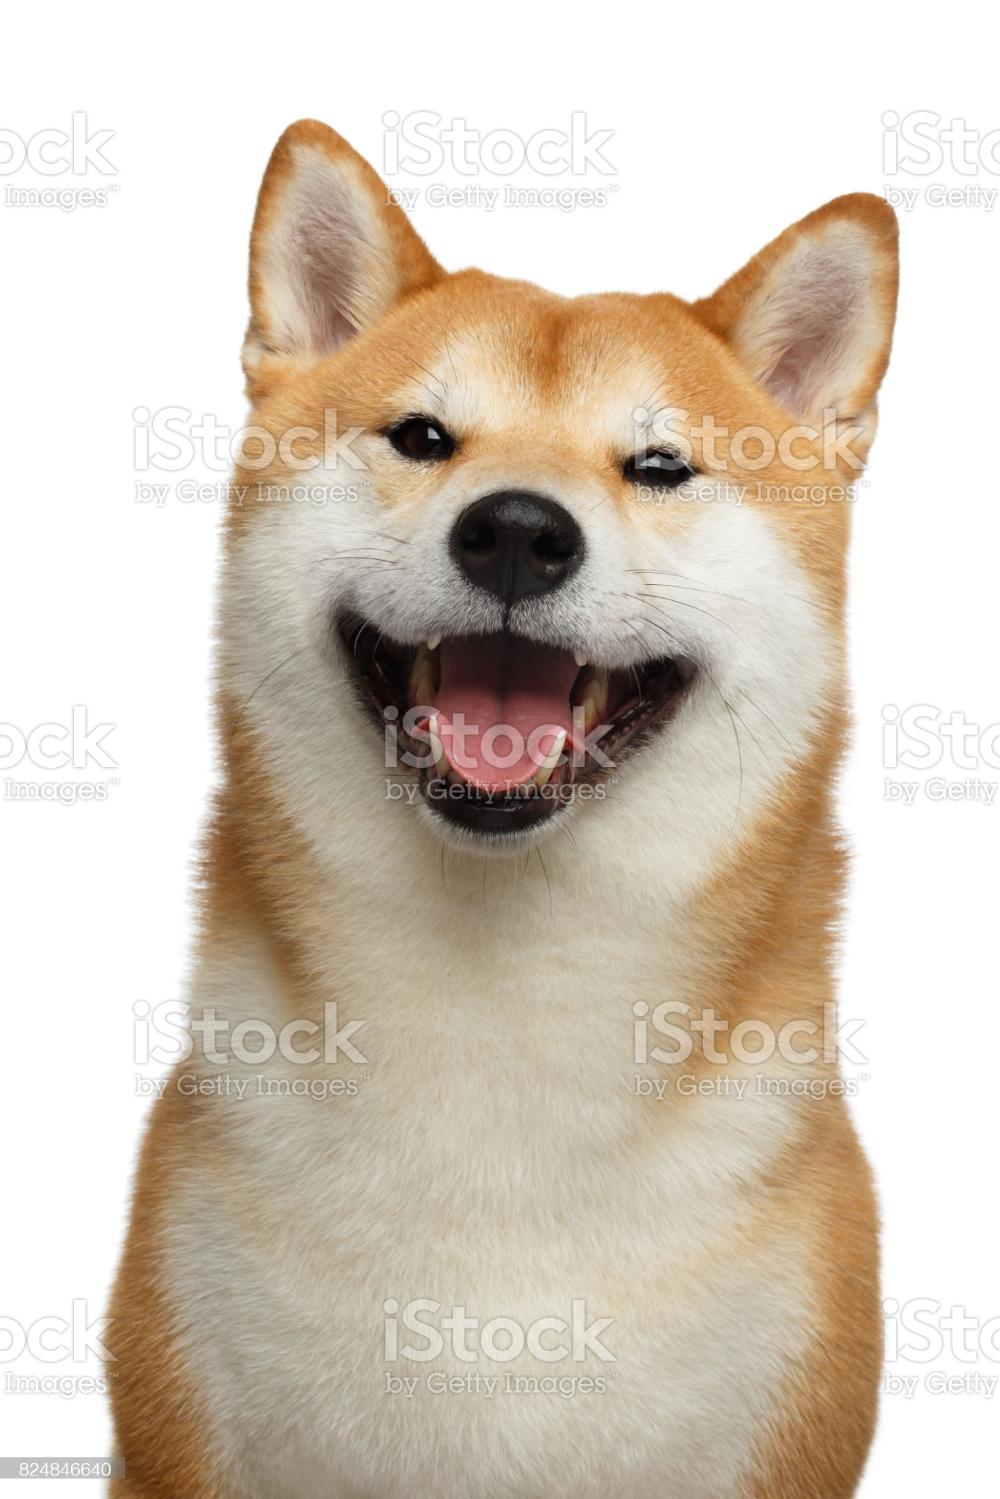 Cute Portrait Of Smiling Shiba Inu Dog On Isolated White Background Shiba Inu Dog Dog Stock Photo Shiba Inu